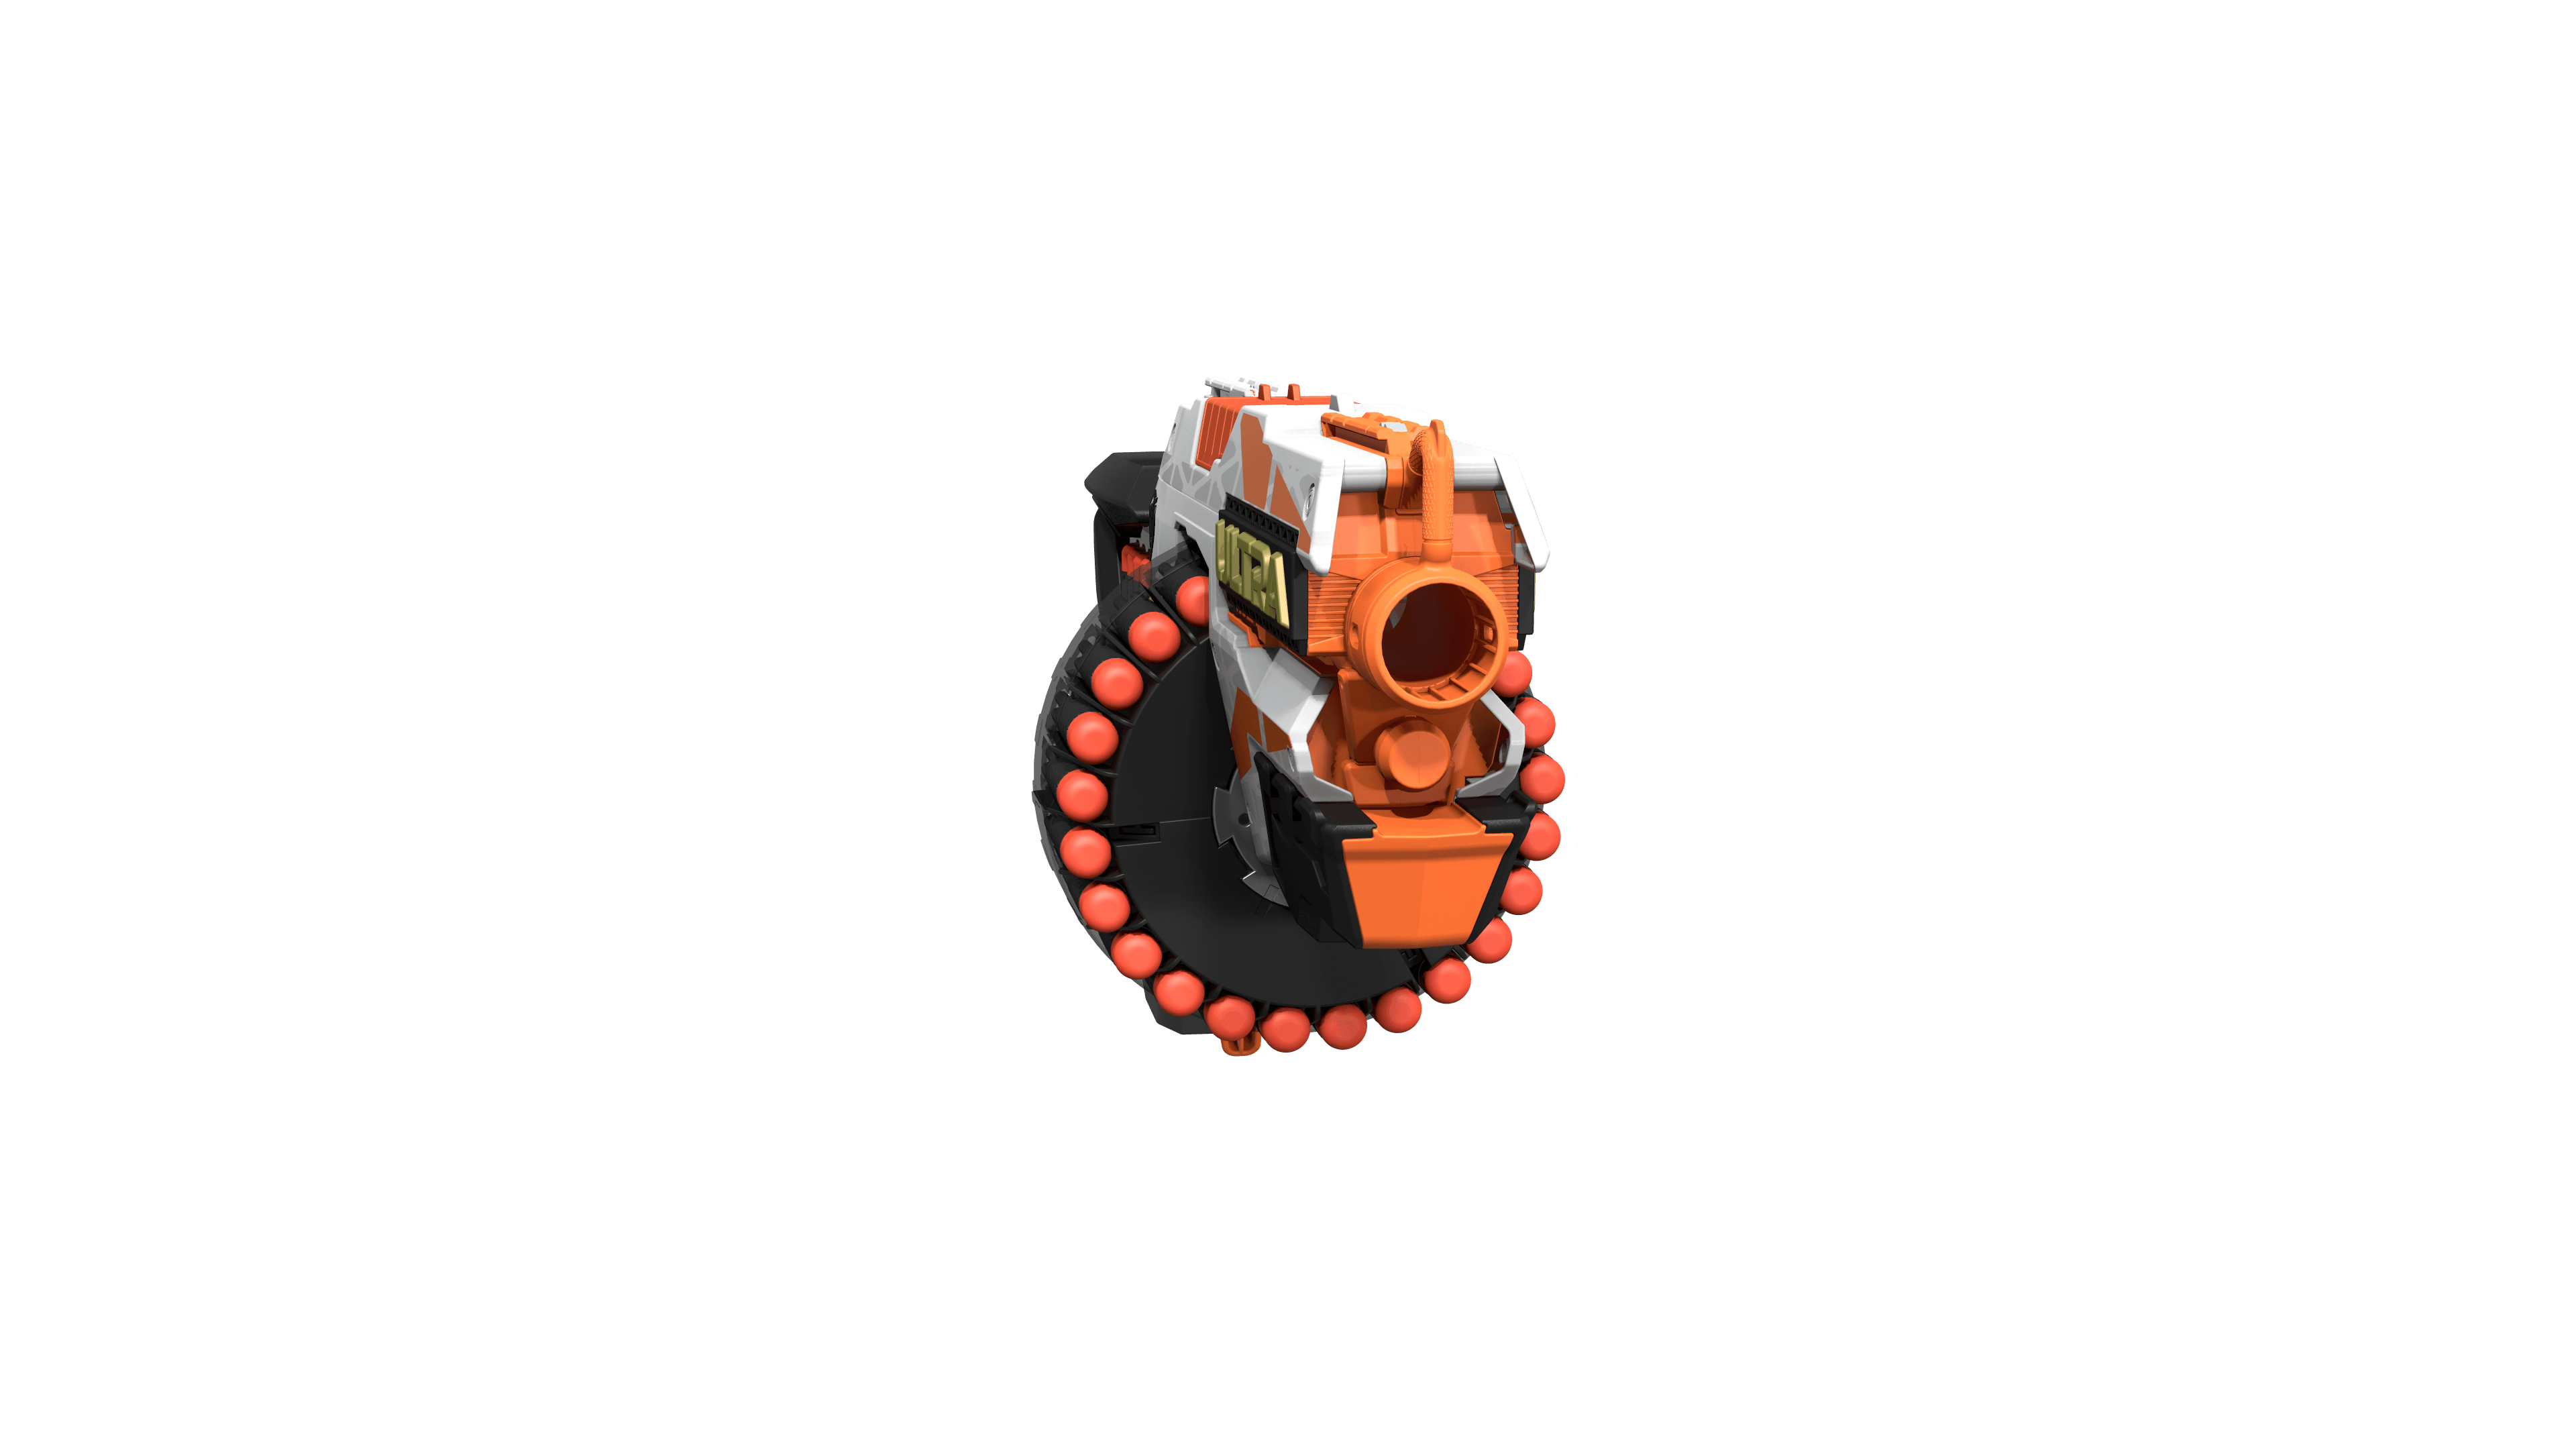 ultra blaster img 95